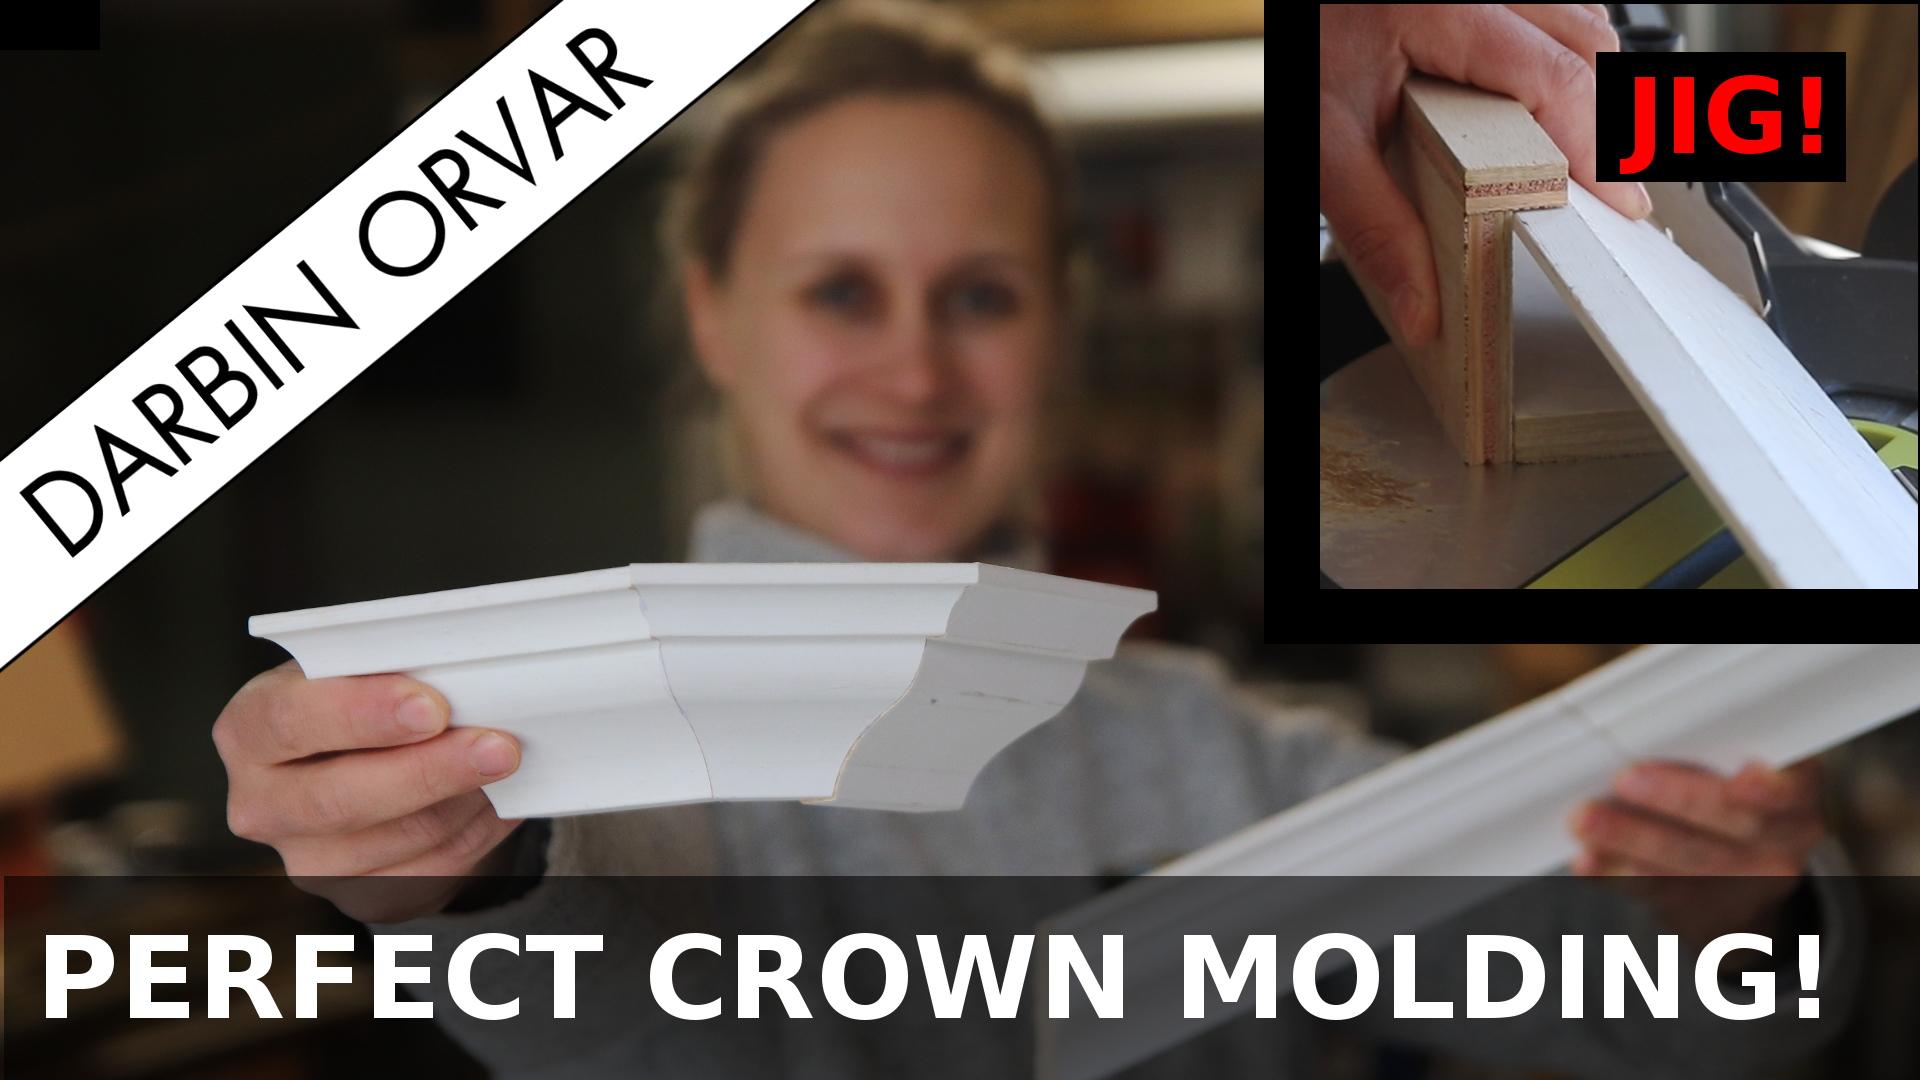 thumb_crown_molding.JPG